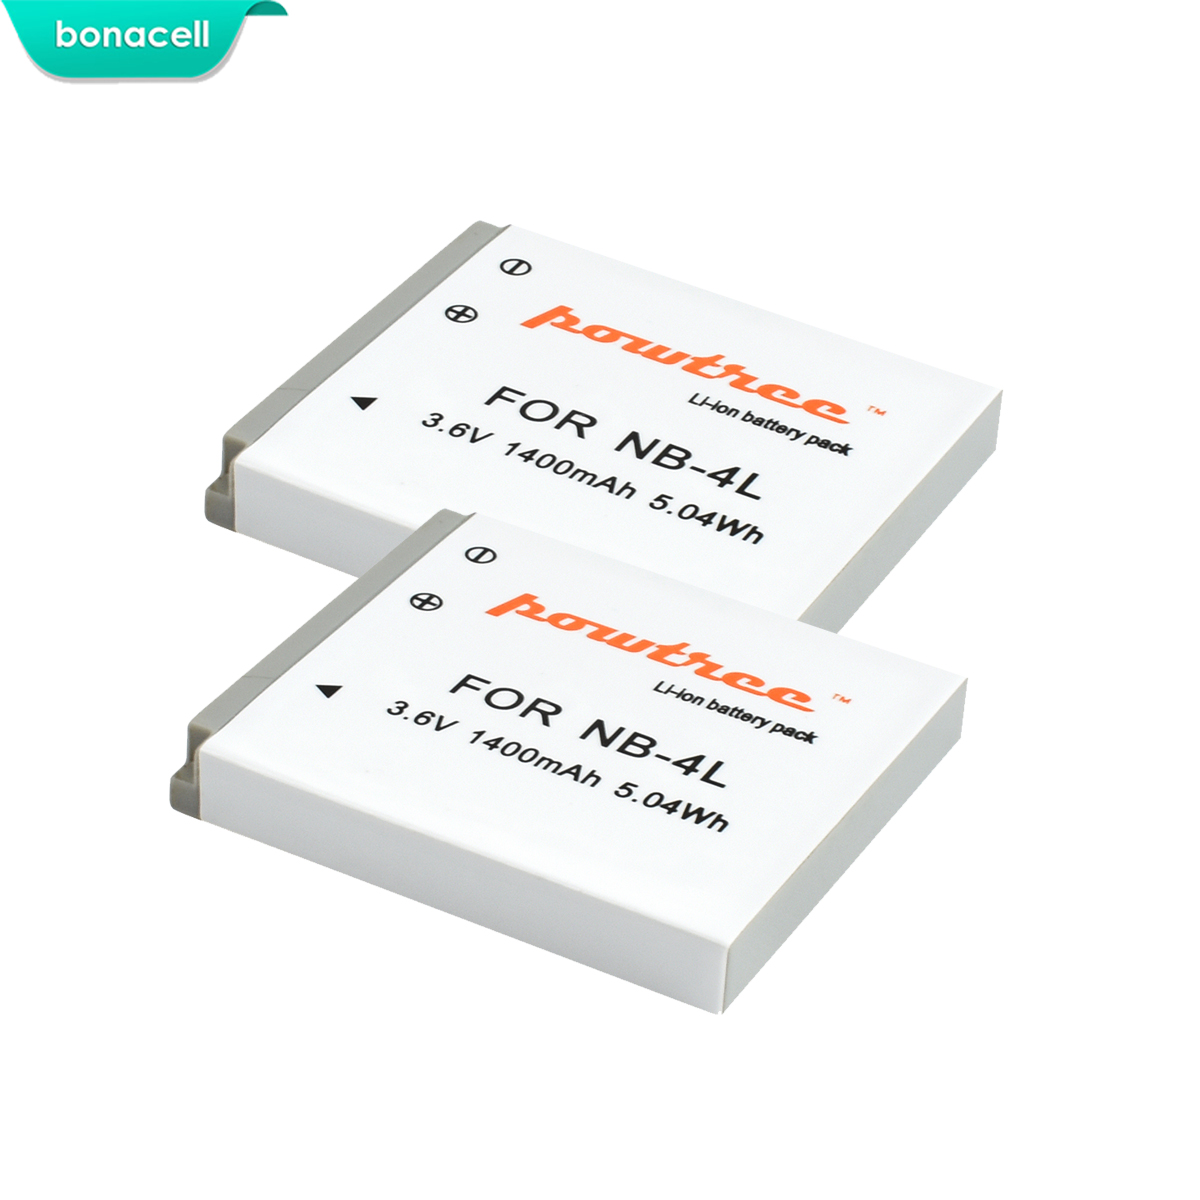 Bonacell 1400 mah NB-4L NB4L 4L Bateria Bateria para Canon IXUS NB 30 40 50 55 60 65 80 100 powerShot SD1000 1100 Câmera L10